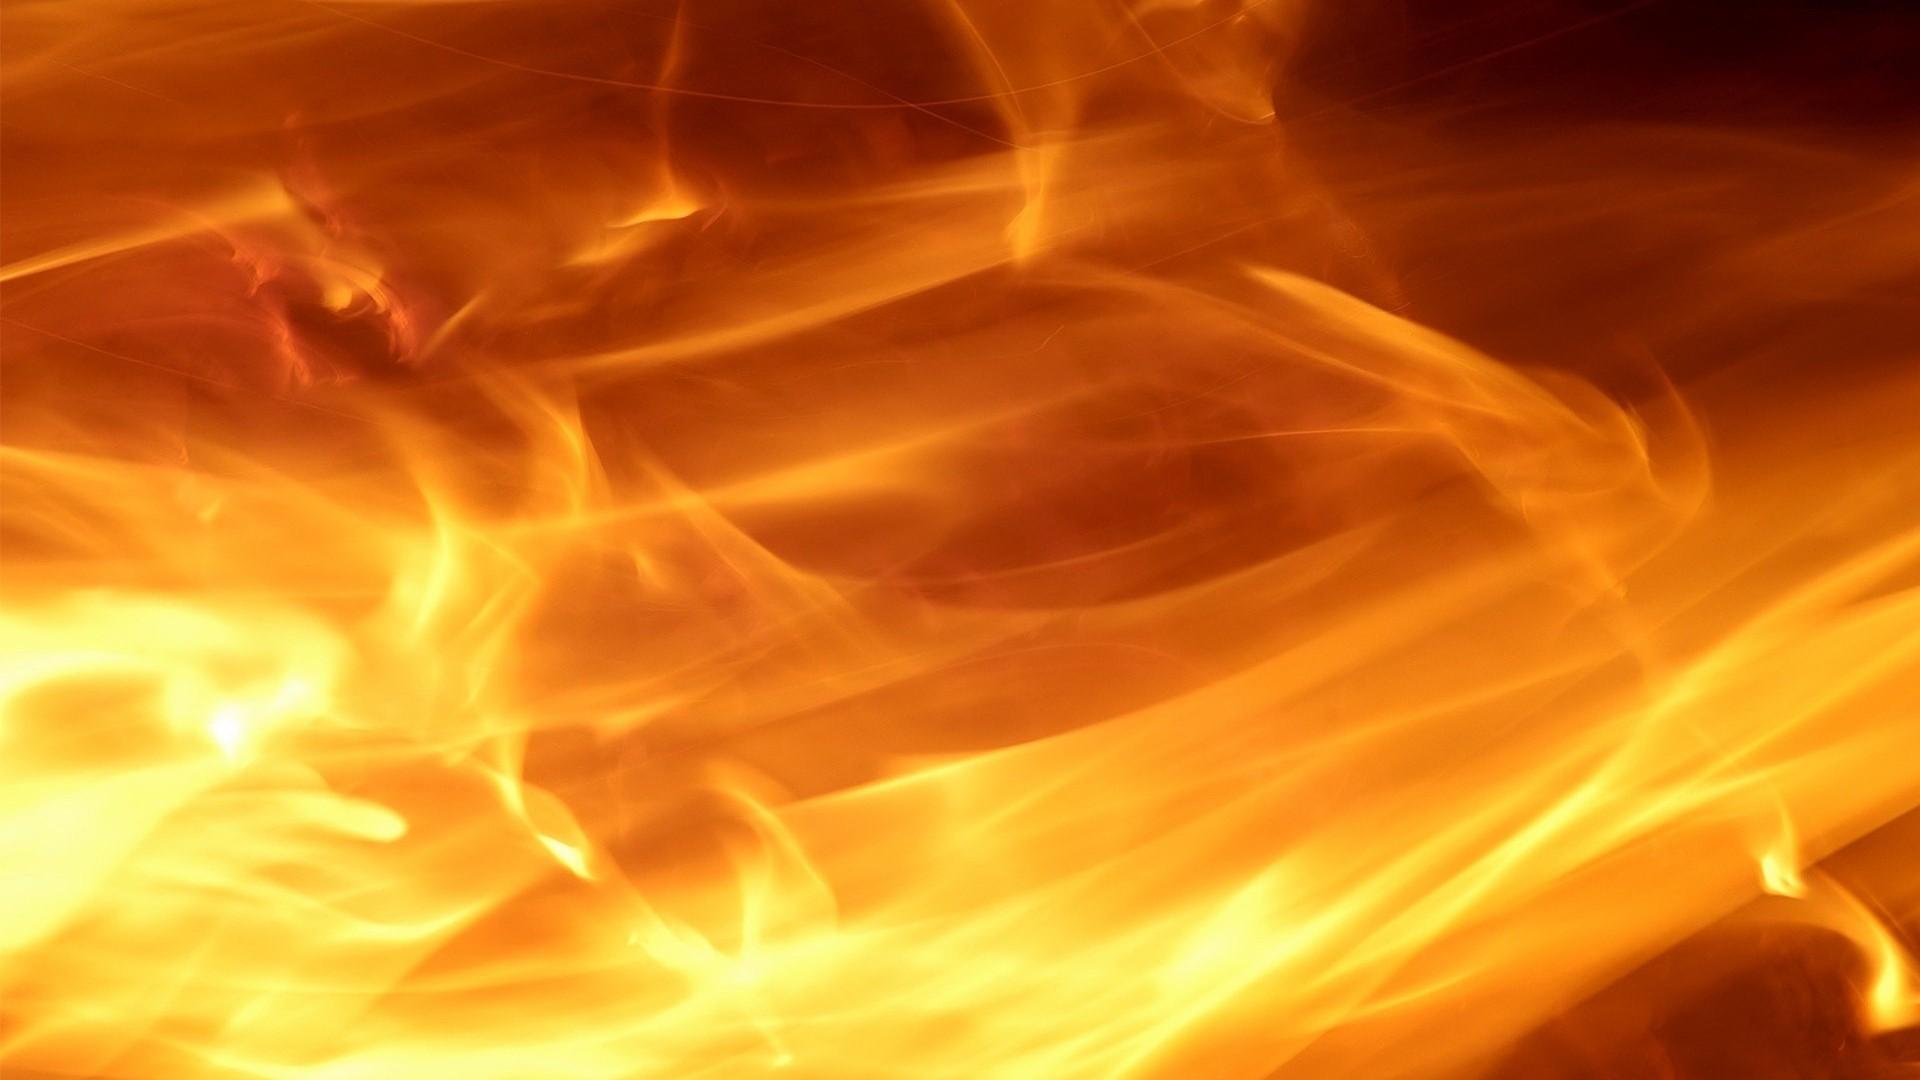 Fire Free Wallpaper Downloads: 55+ Fire Backgrounds ·① Download Free Beautiful High